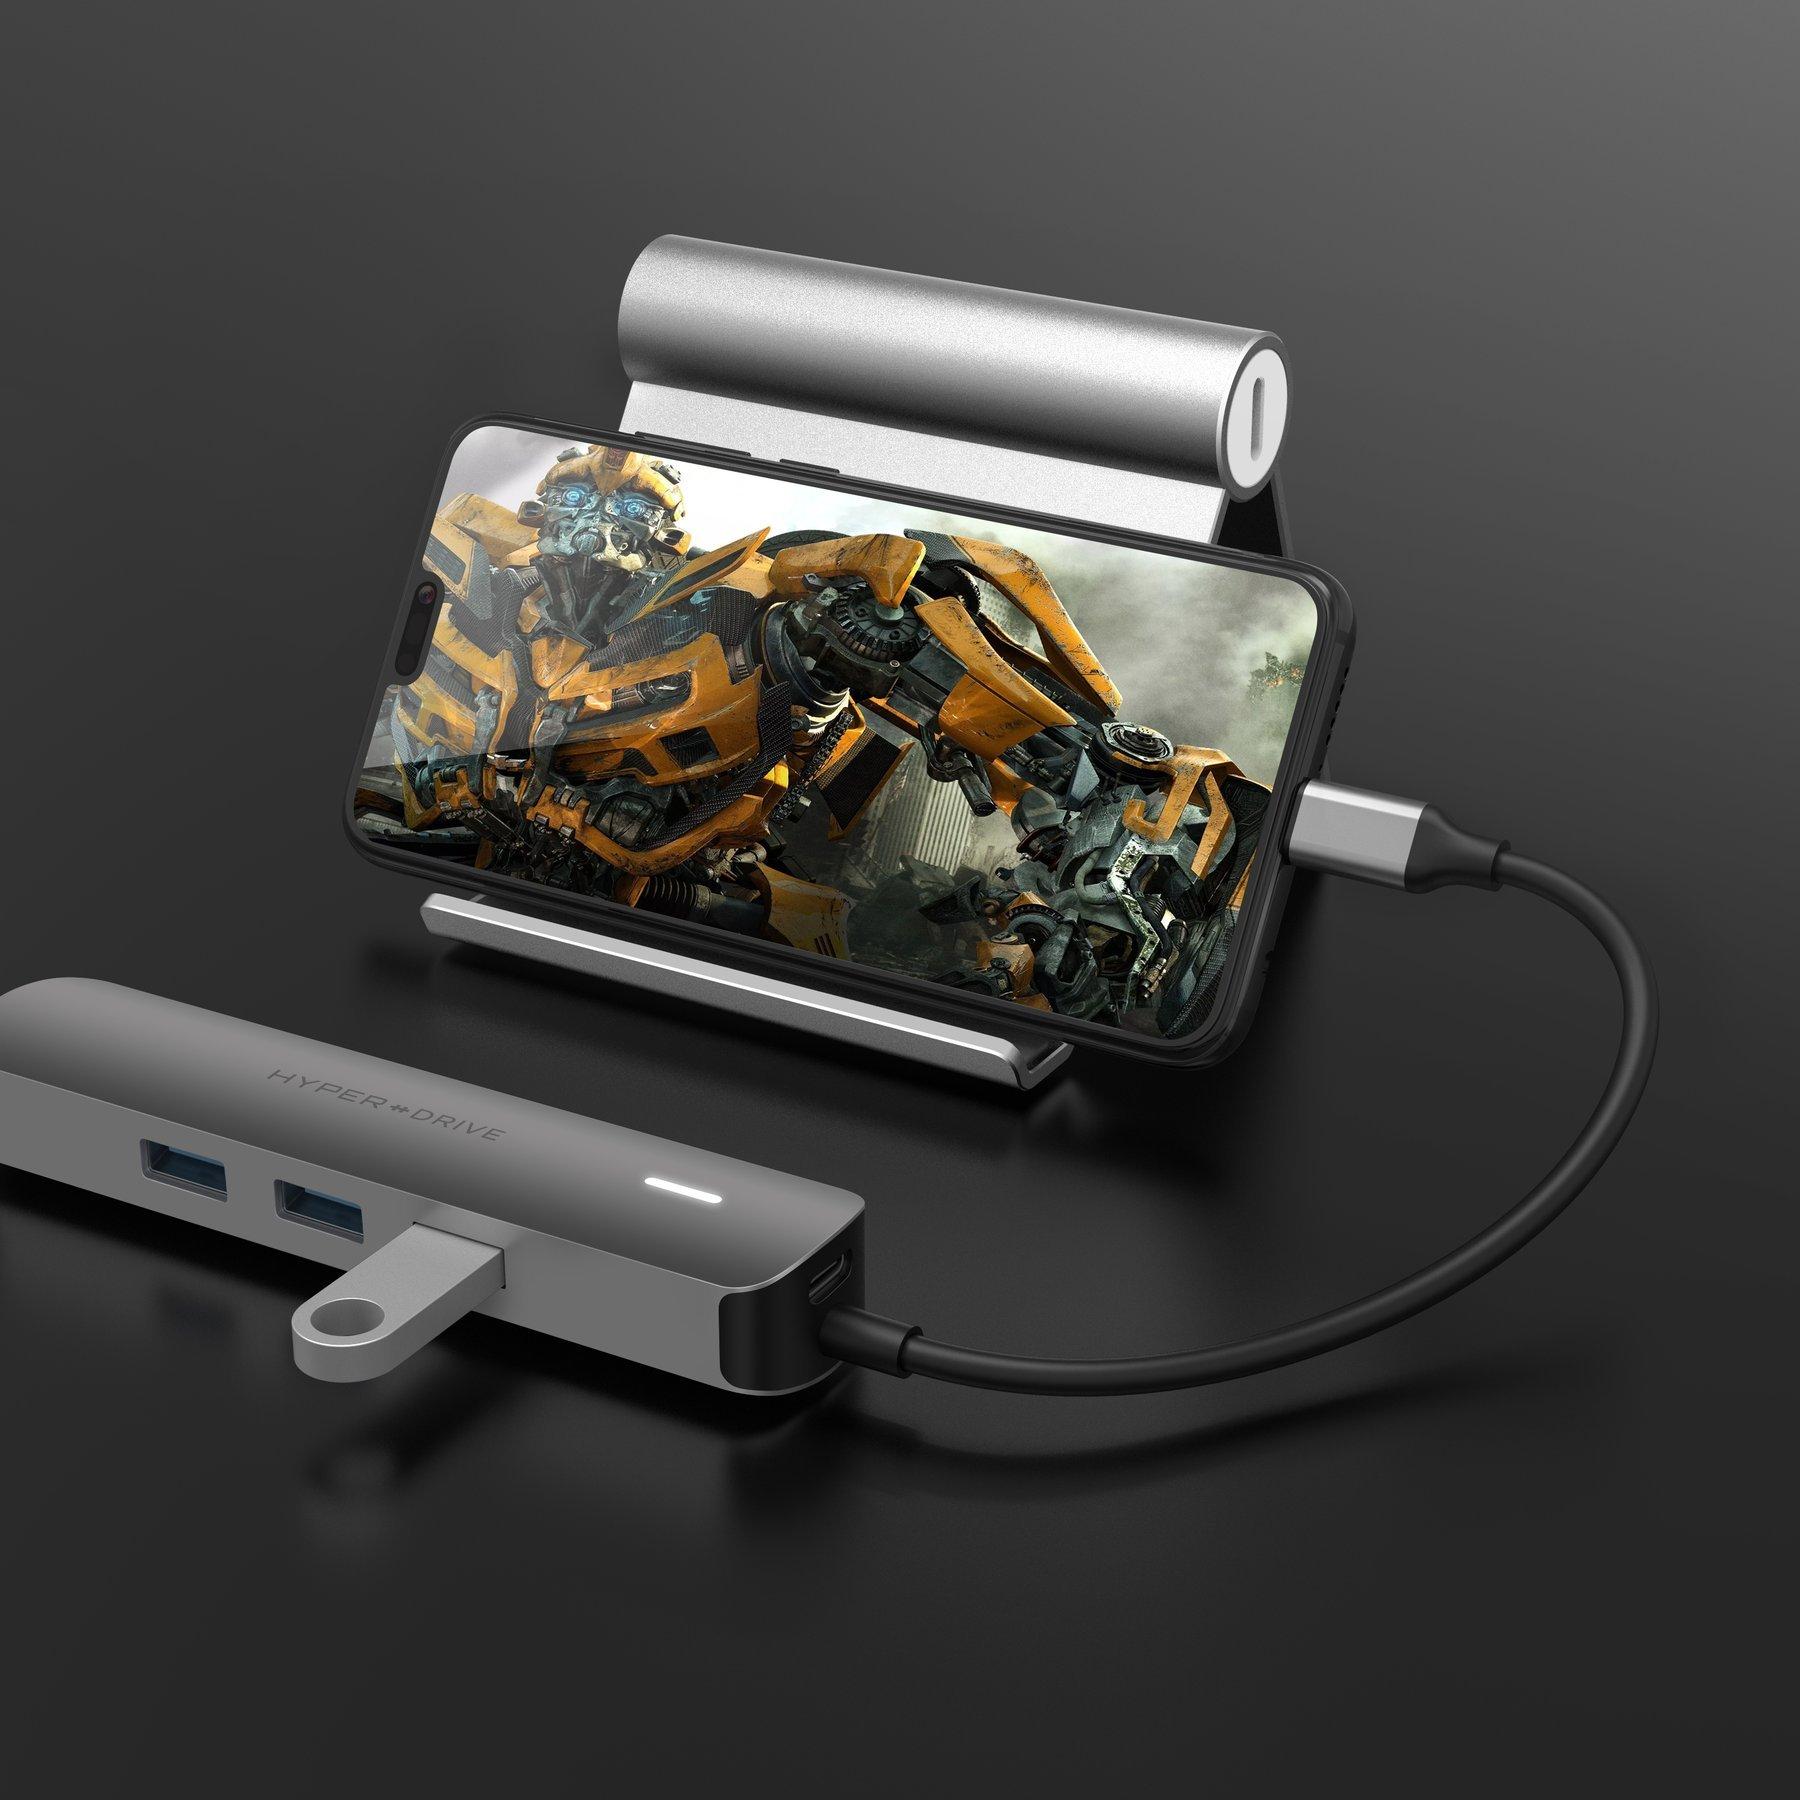 GEARVN.COM CỔNG CHUYỂN HYPERDRIVE 4K HDMI 6-IN-1 USB-C HUB FOR MACBOOK, SURFACE, ULTRABOOK, CHROMEBOOK, PC & USB-C DEVICES -HD233B